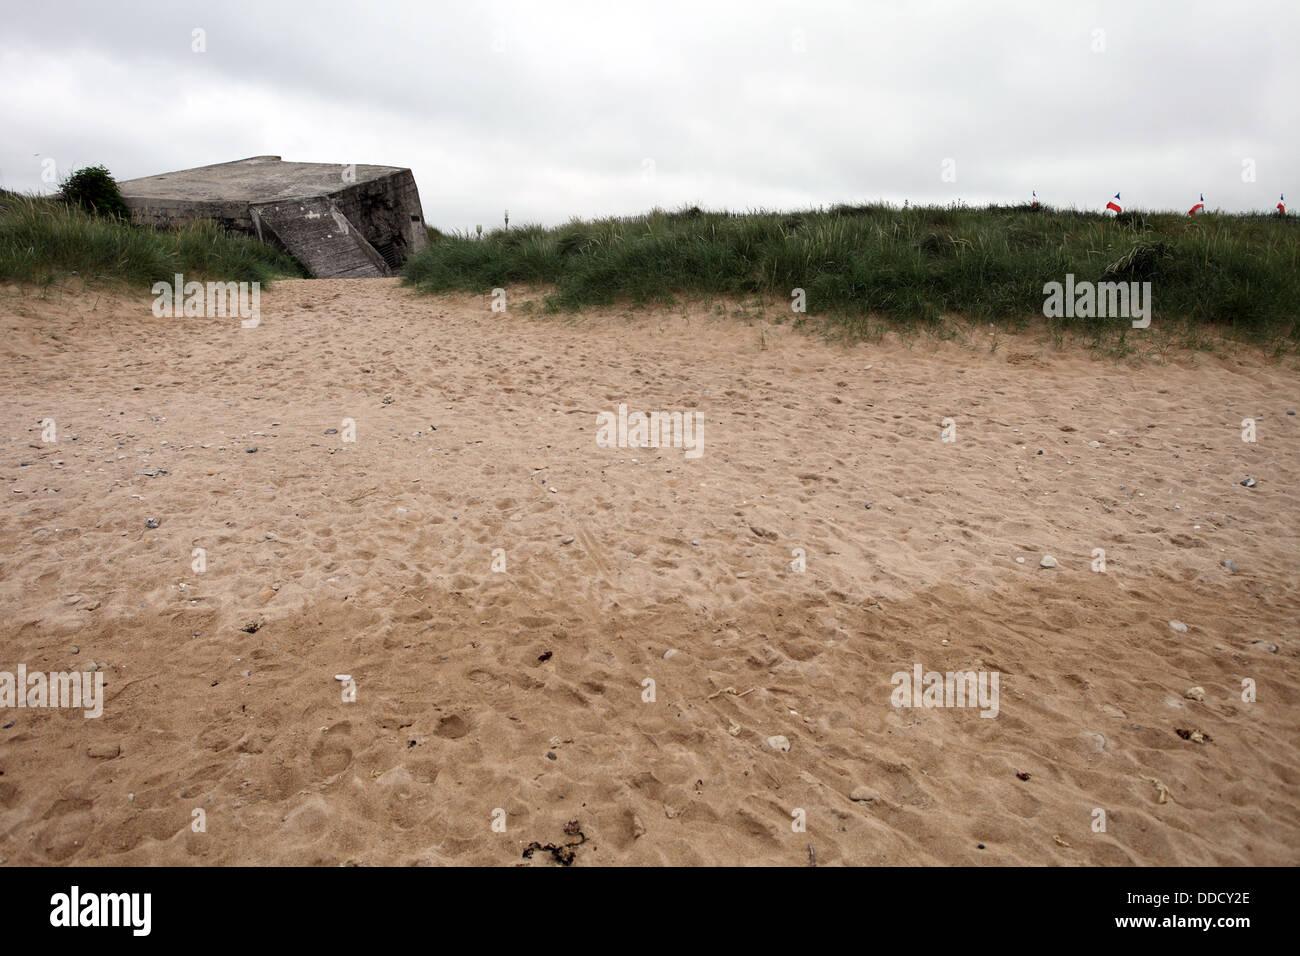 Juno Beach Courseulles-sur-Mer, Normandy, France - Stock Image